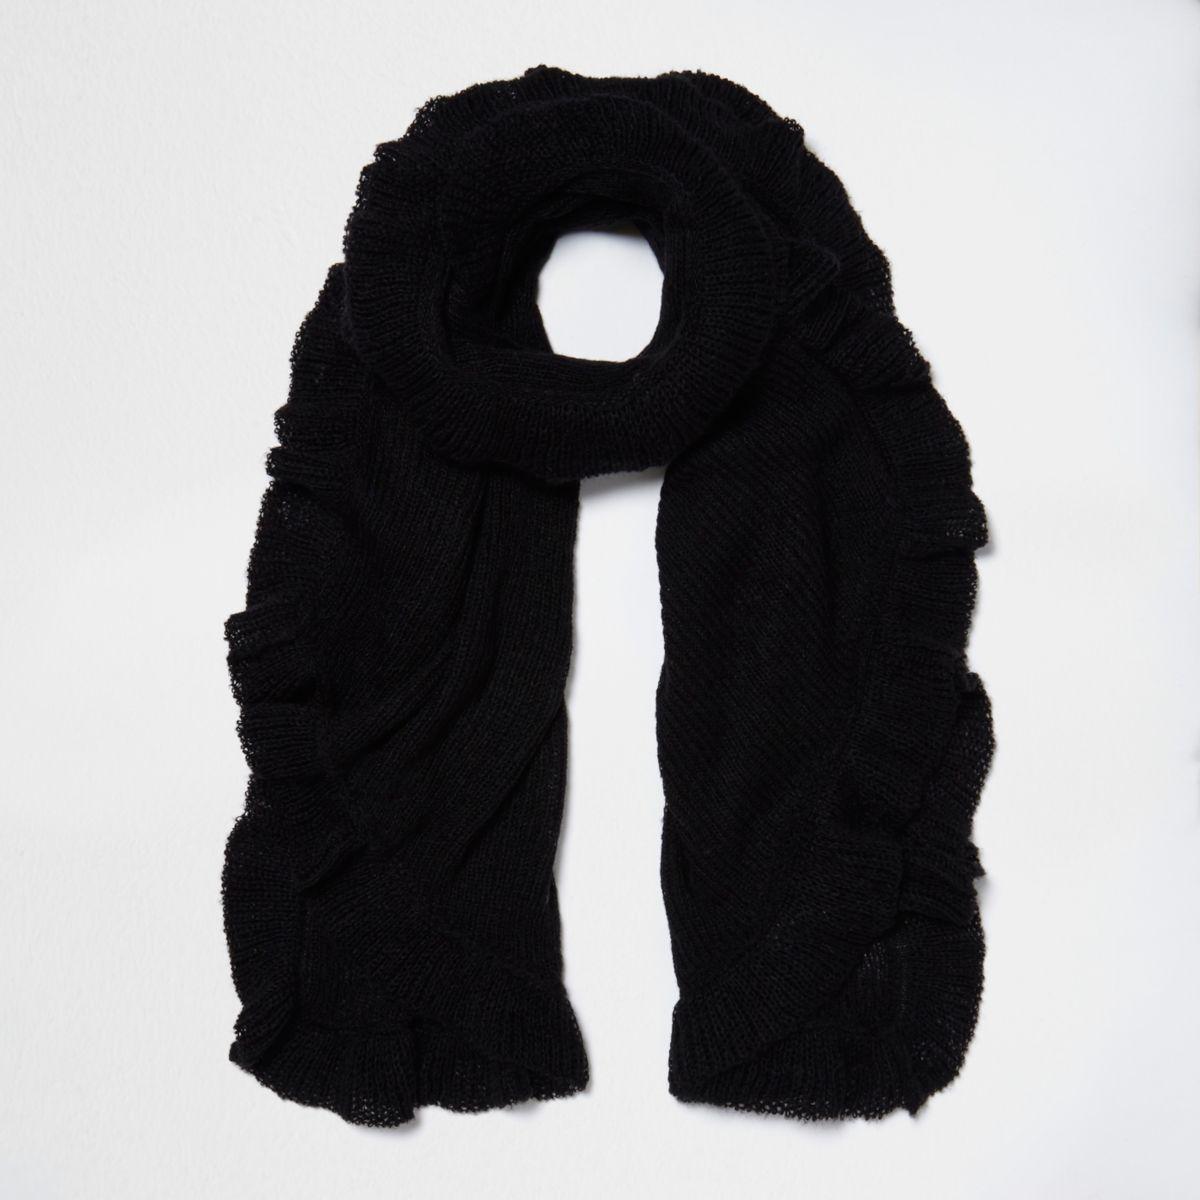 Black frill hem knit scarf